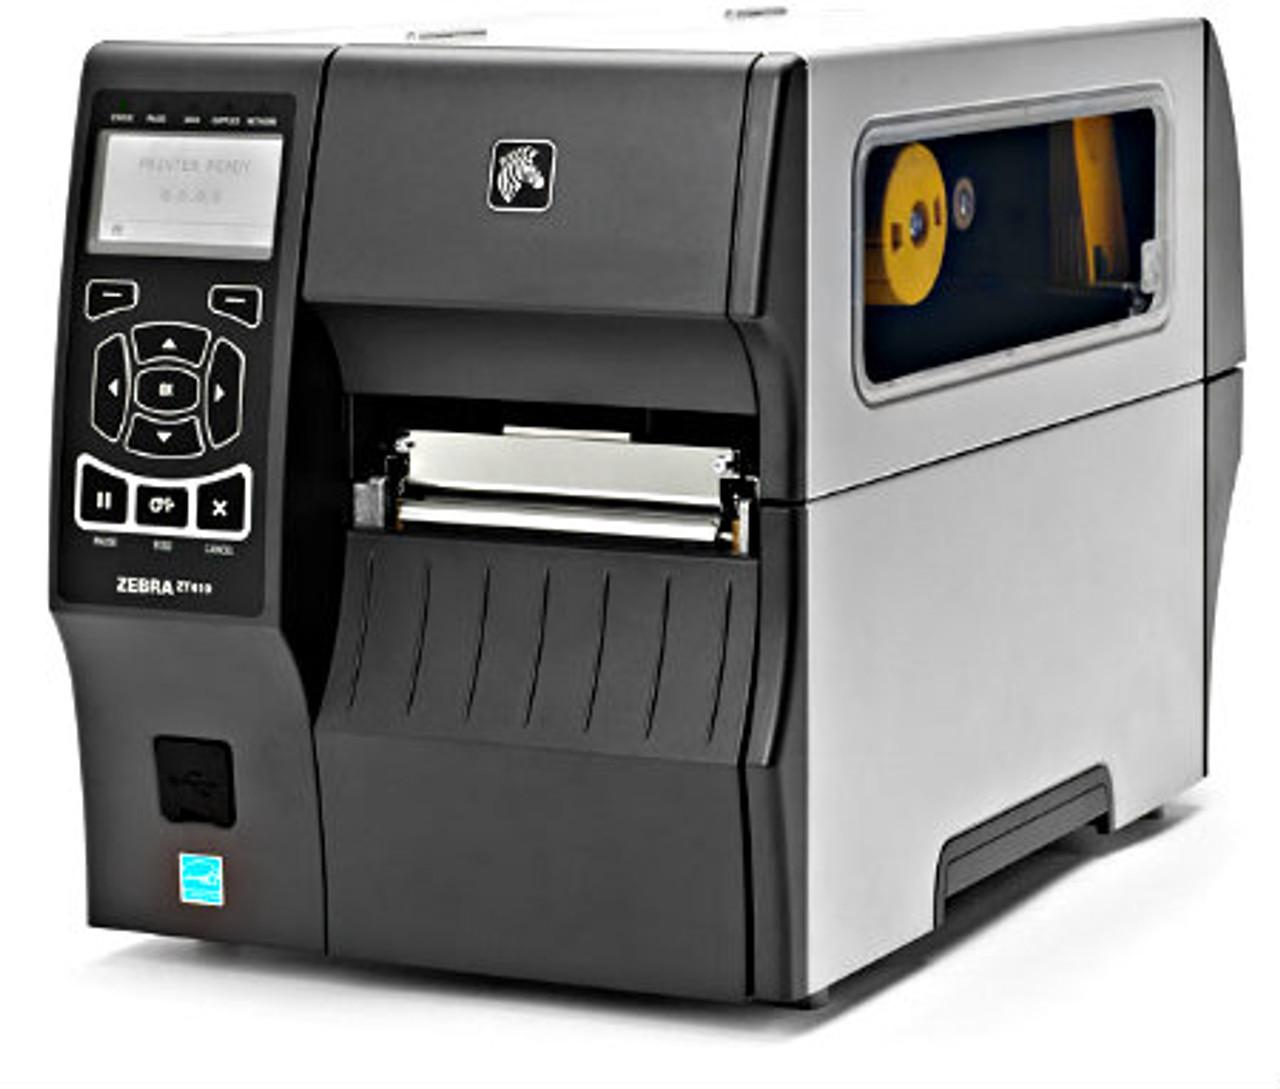 Zebra ZT410 203dpi TT Printer ETH/BT/USB/Serial and Internal Rewinder